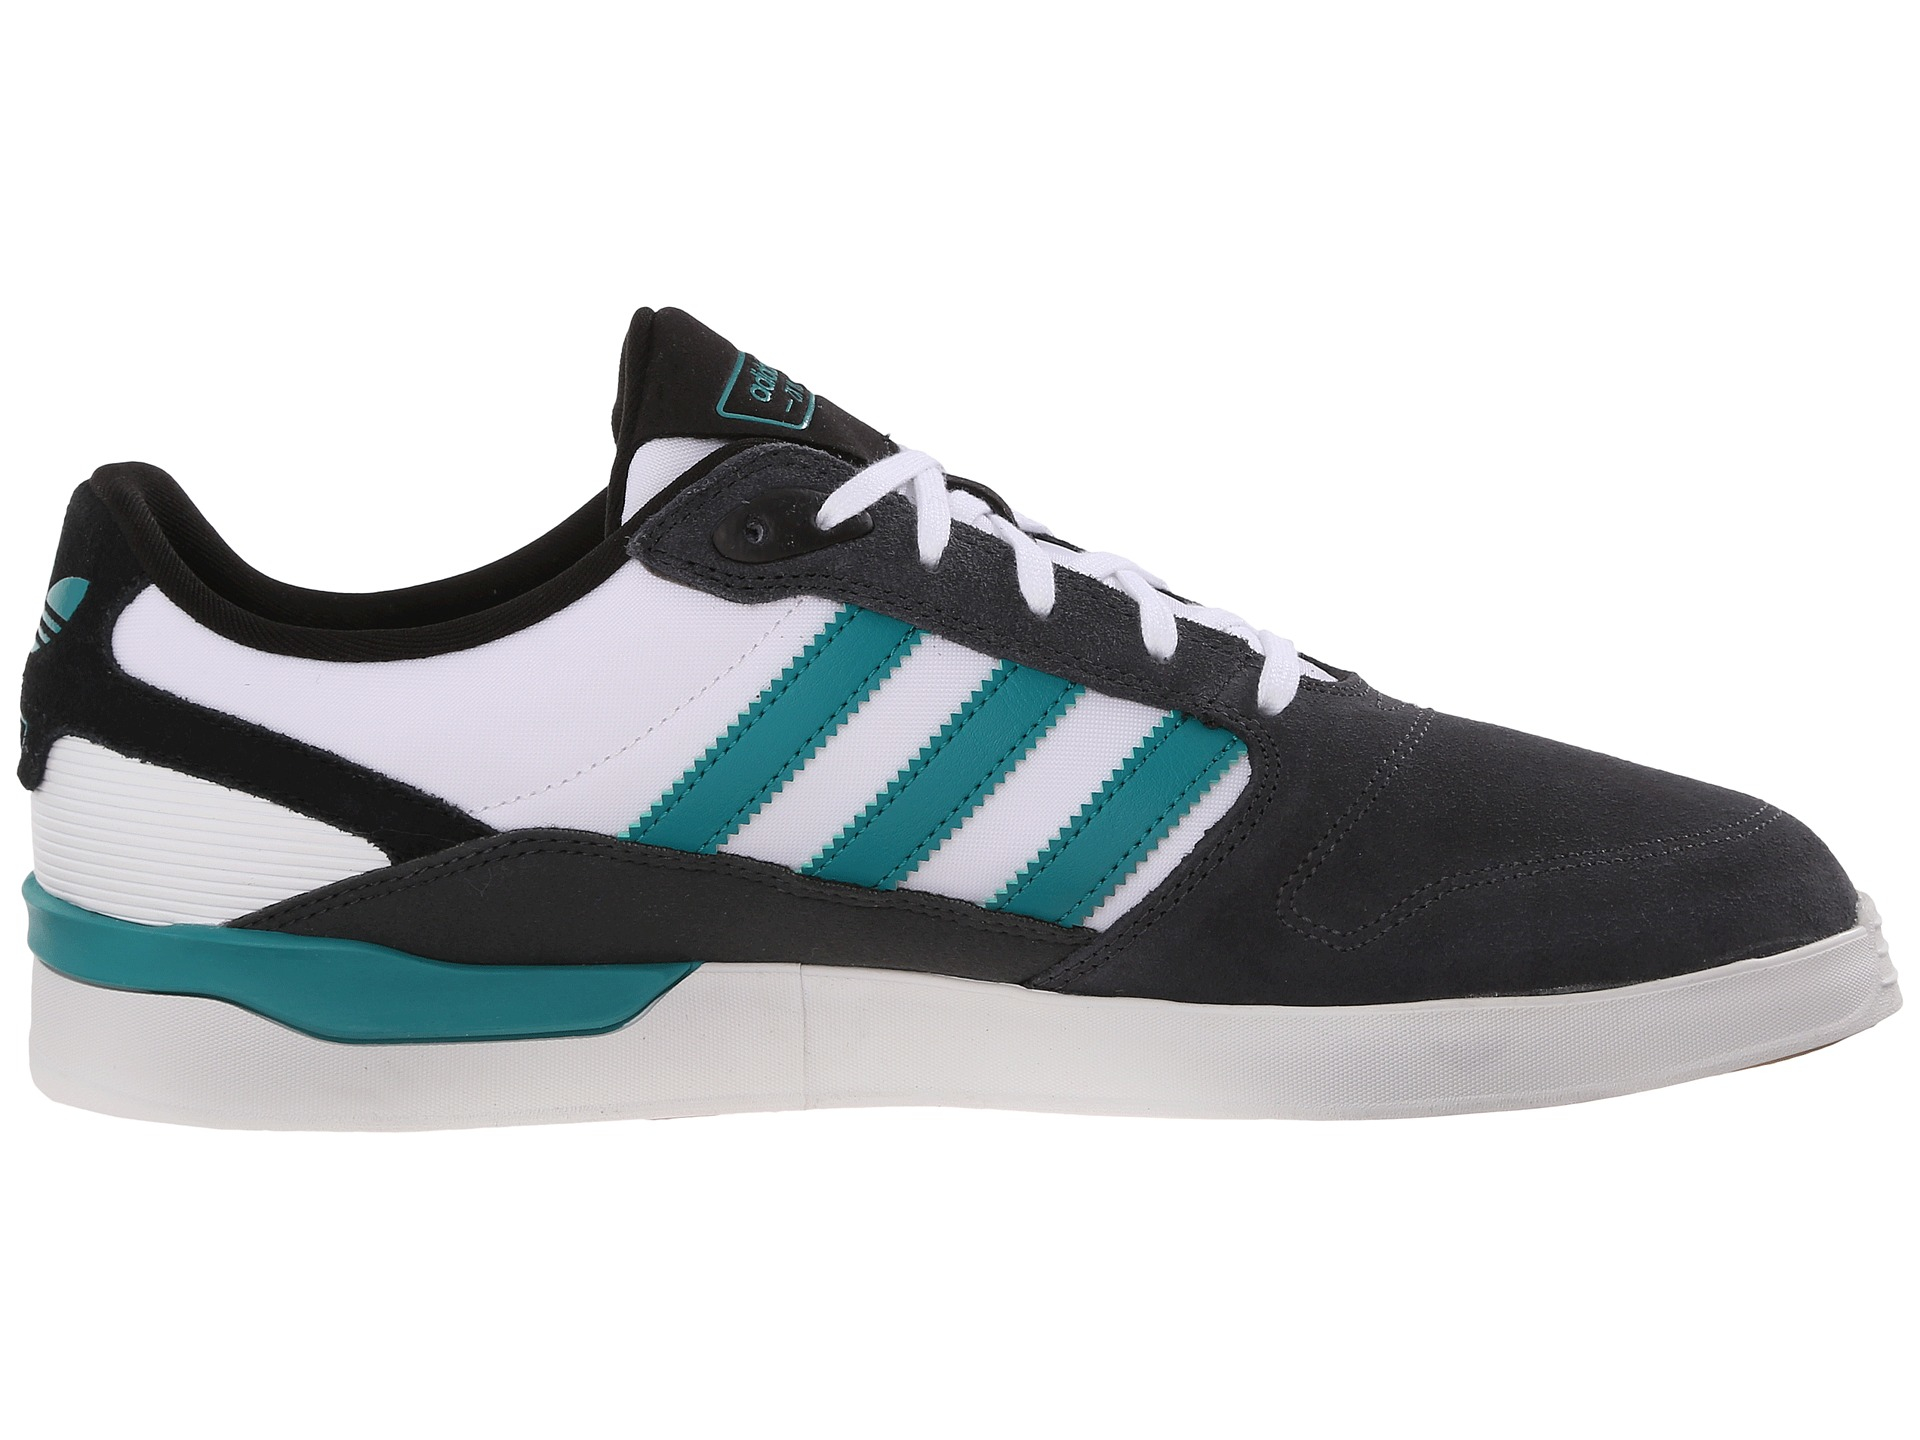 Adidas Superstar Prezzo Ebay